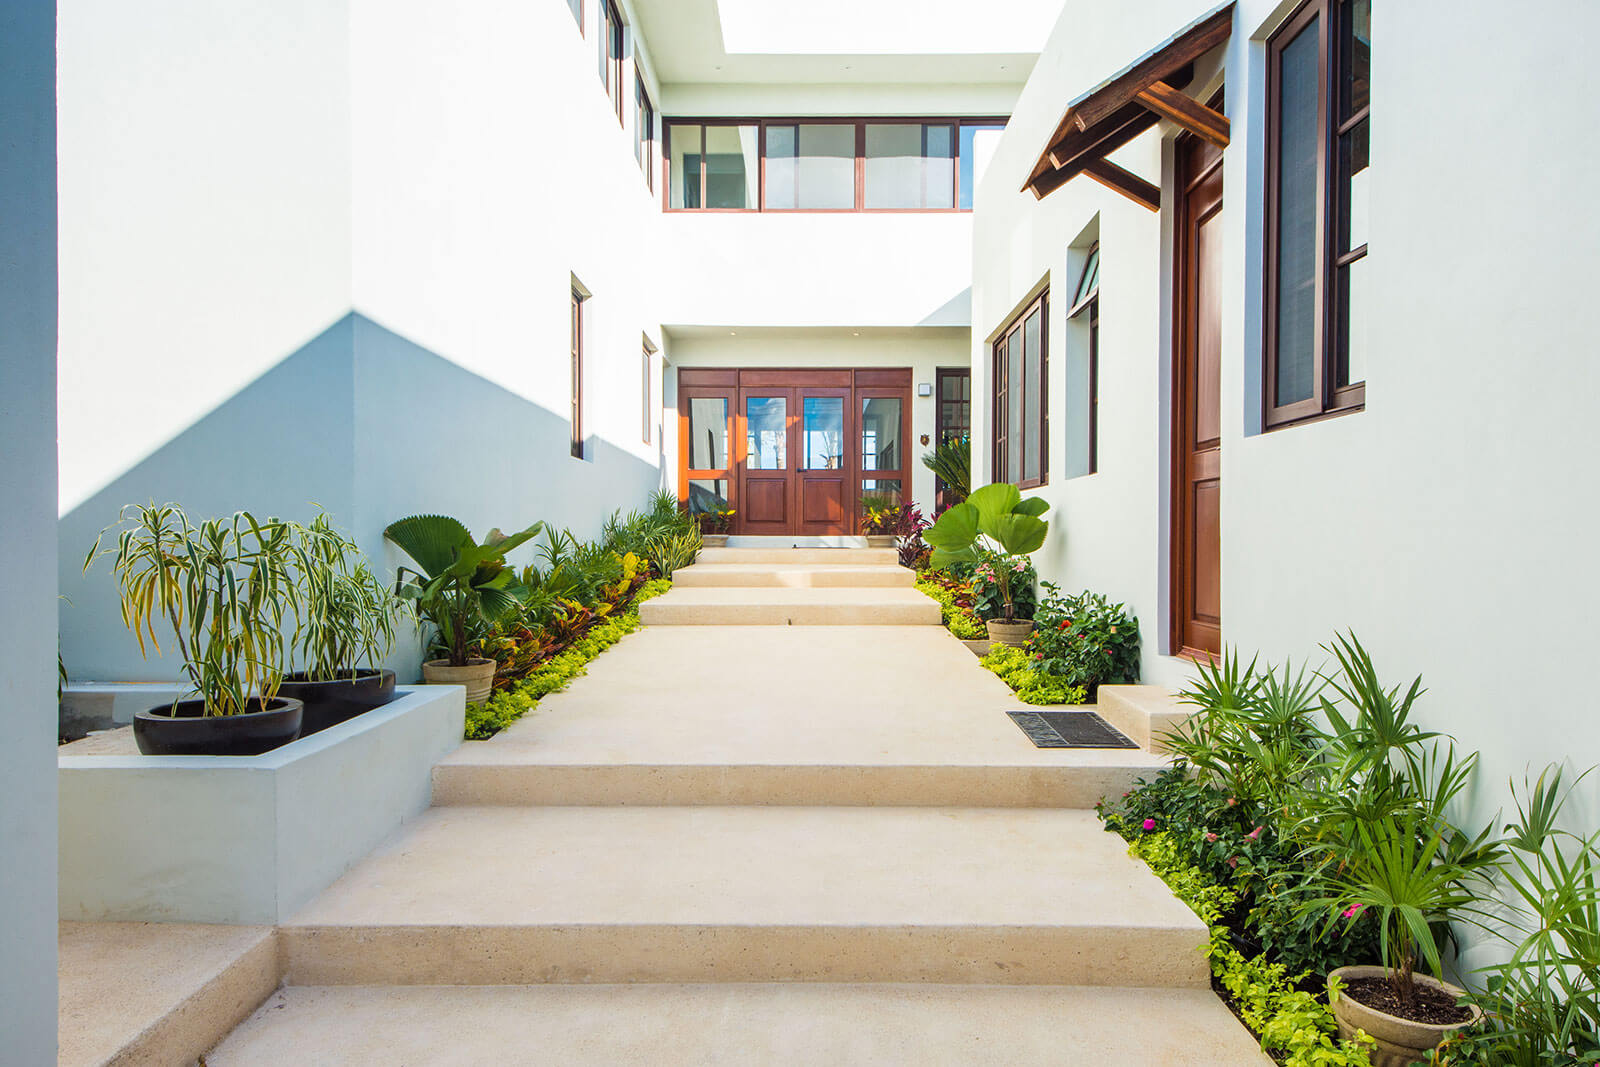 Maya_Luxe_Riviera_Maya_Luxury_Villas_Experiences_Tulum_Soliman_Bay_5_Bedrooms_40.jpg